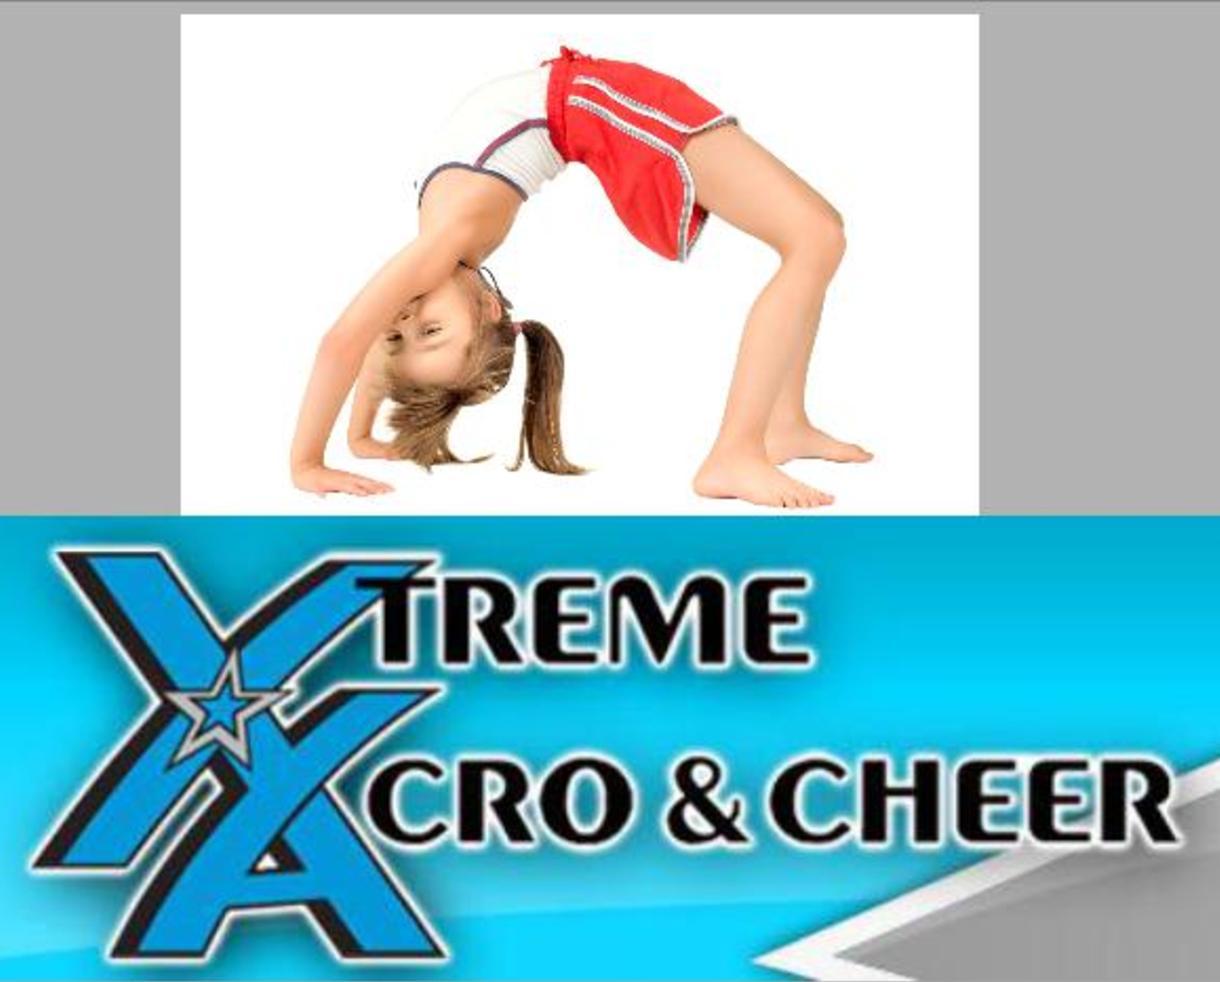 Xtreme Stars Gymnastics, Trampoline, Acrobatics & Cheerleading Camp